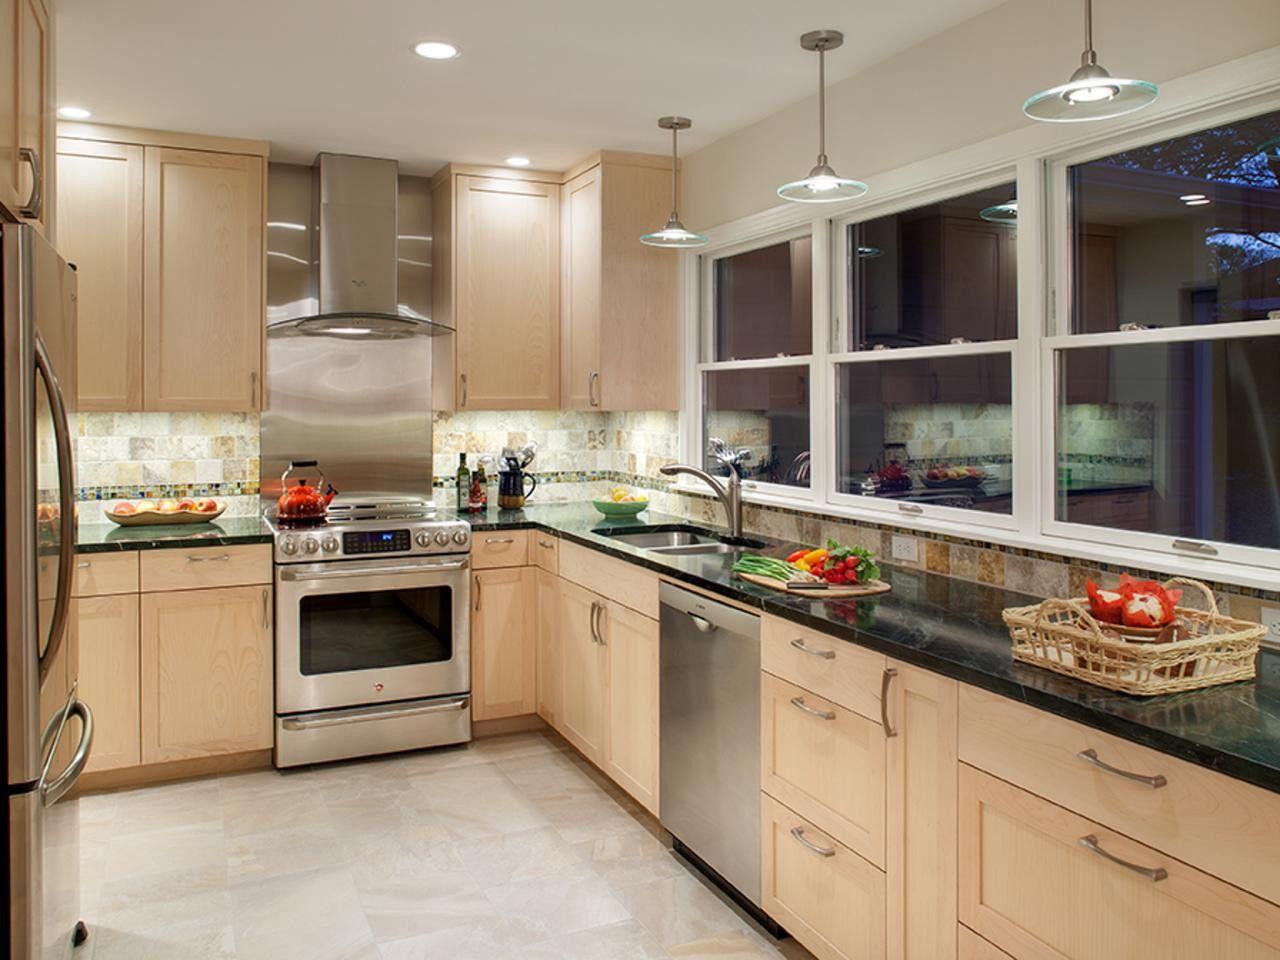 kitchen under cabinet lighting options